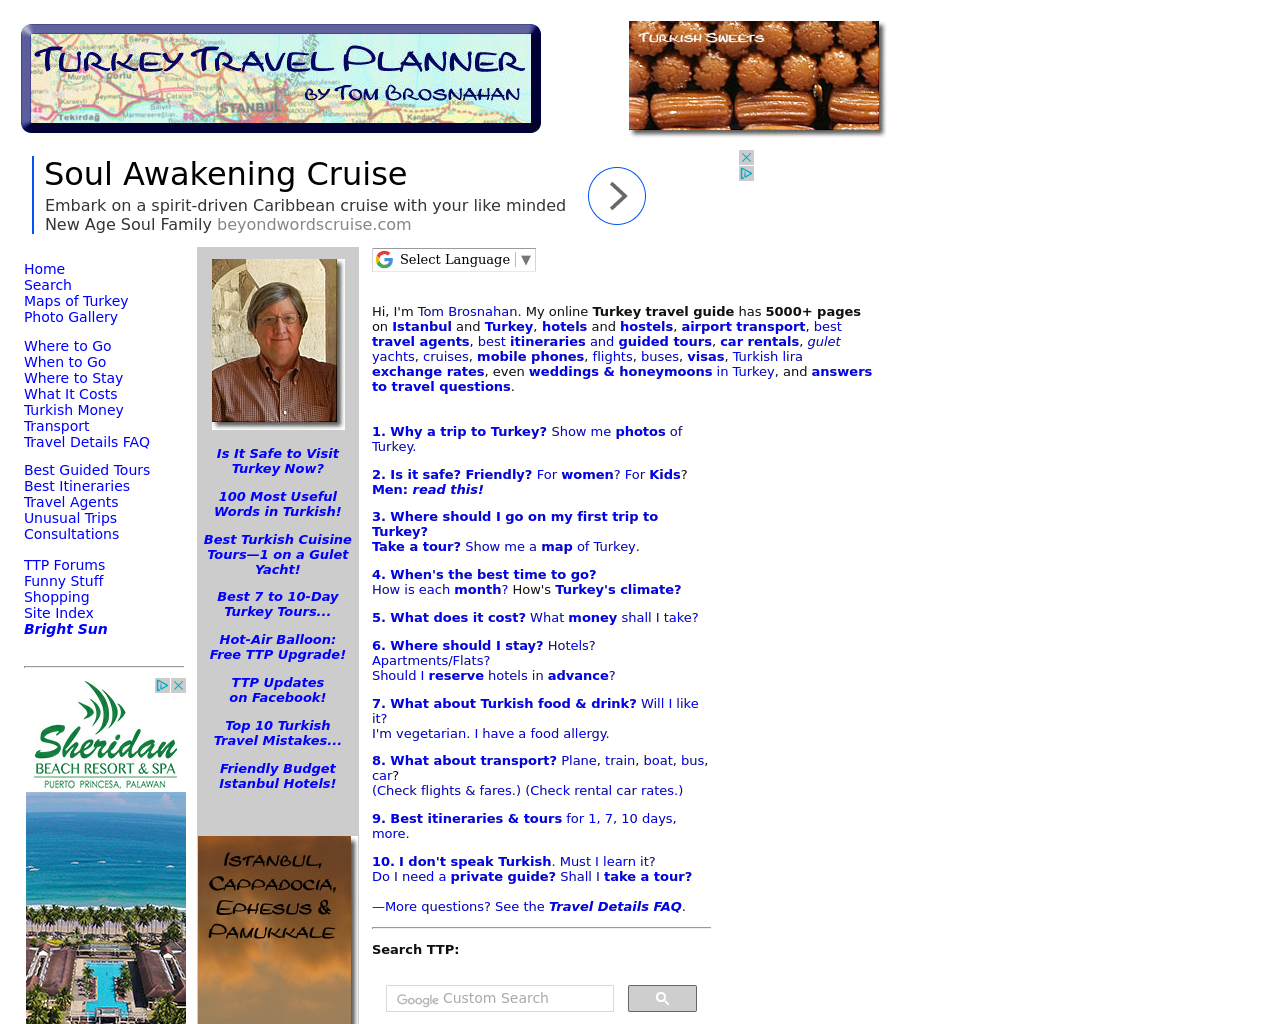 Turkey-Travel-Planner-Advertising-Reviews-Pricing